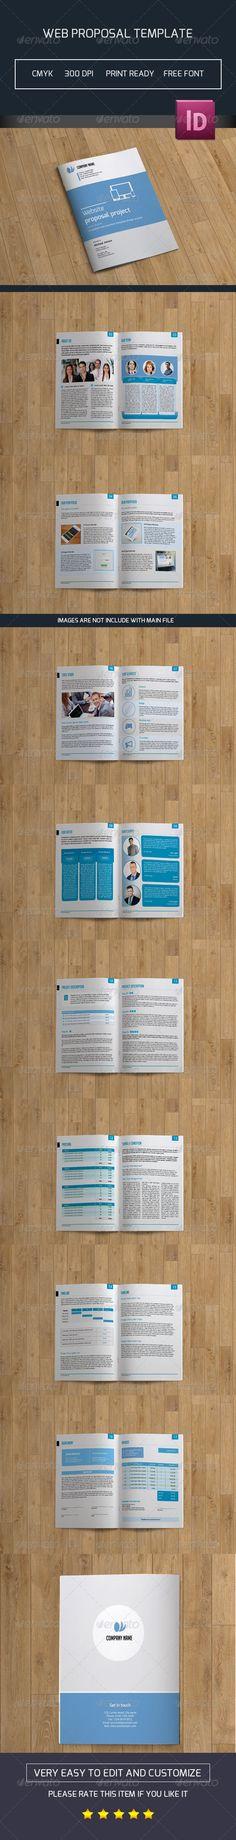 Company Proposal Template Proposal templates, Branding design - web design proposal template